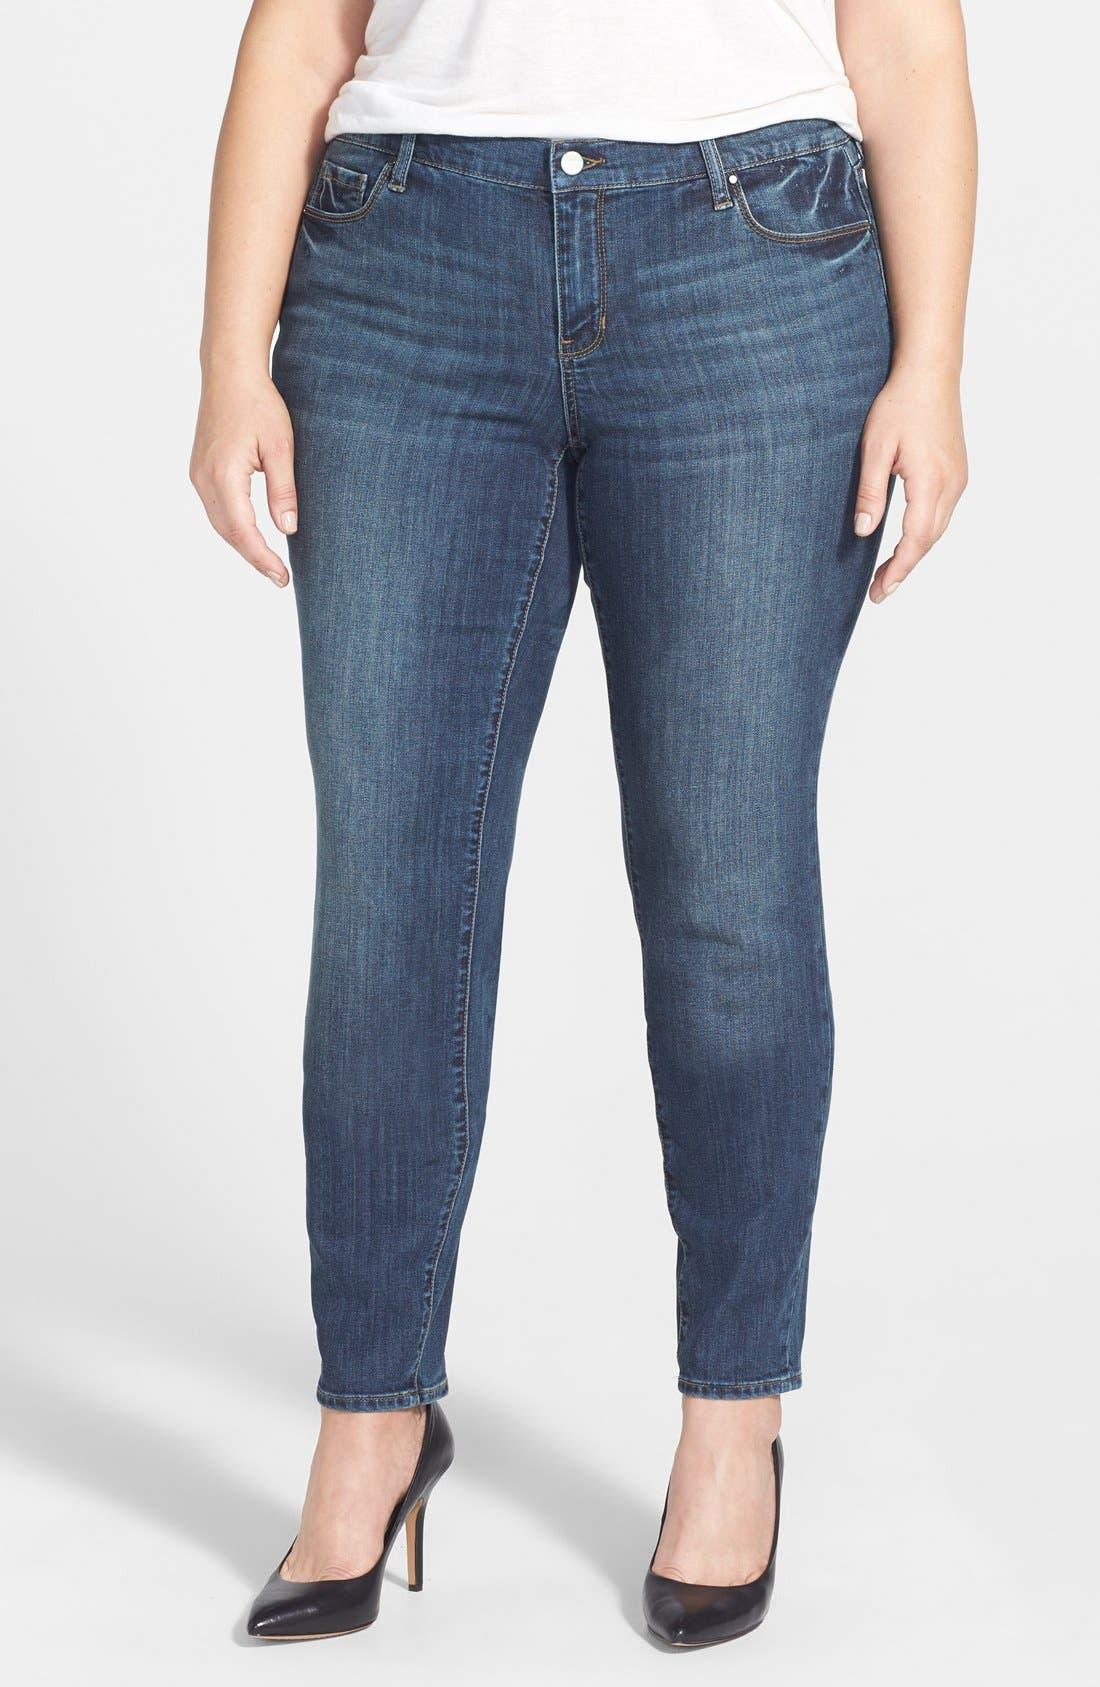 'Soho' Stretch Skinny Jeans,                             Main thumbnail 1, color,                             462